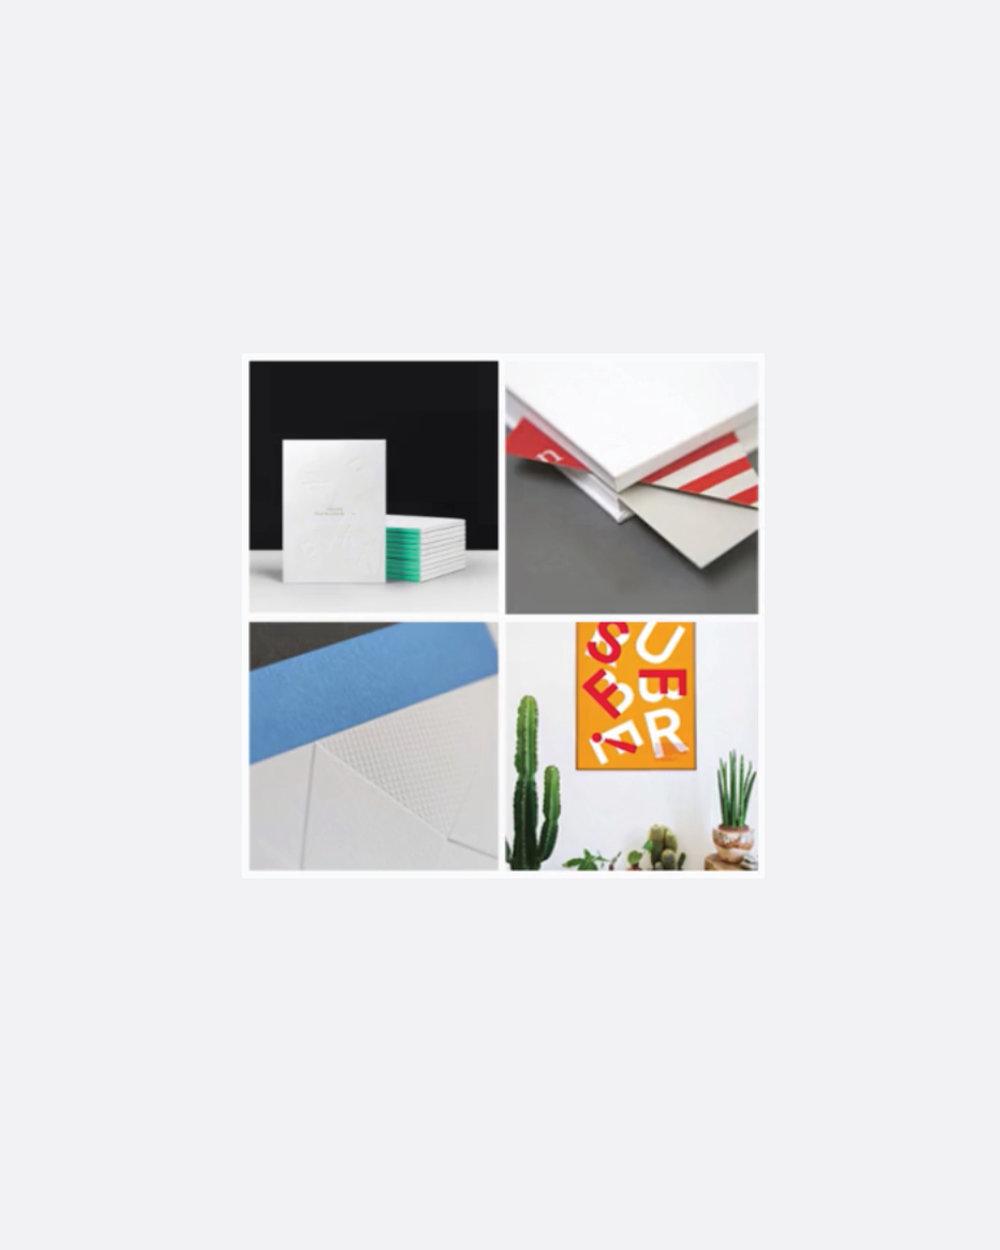 Spread Squarespacecolorgran.jpg